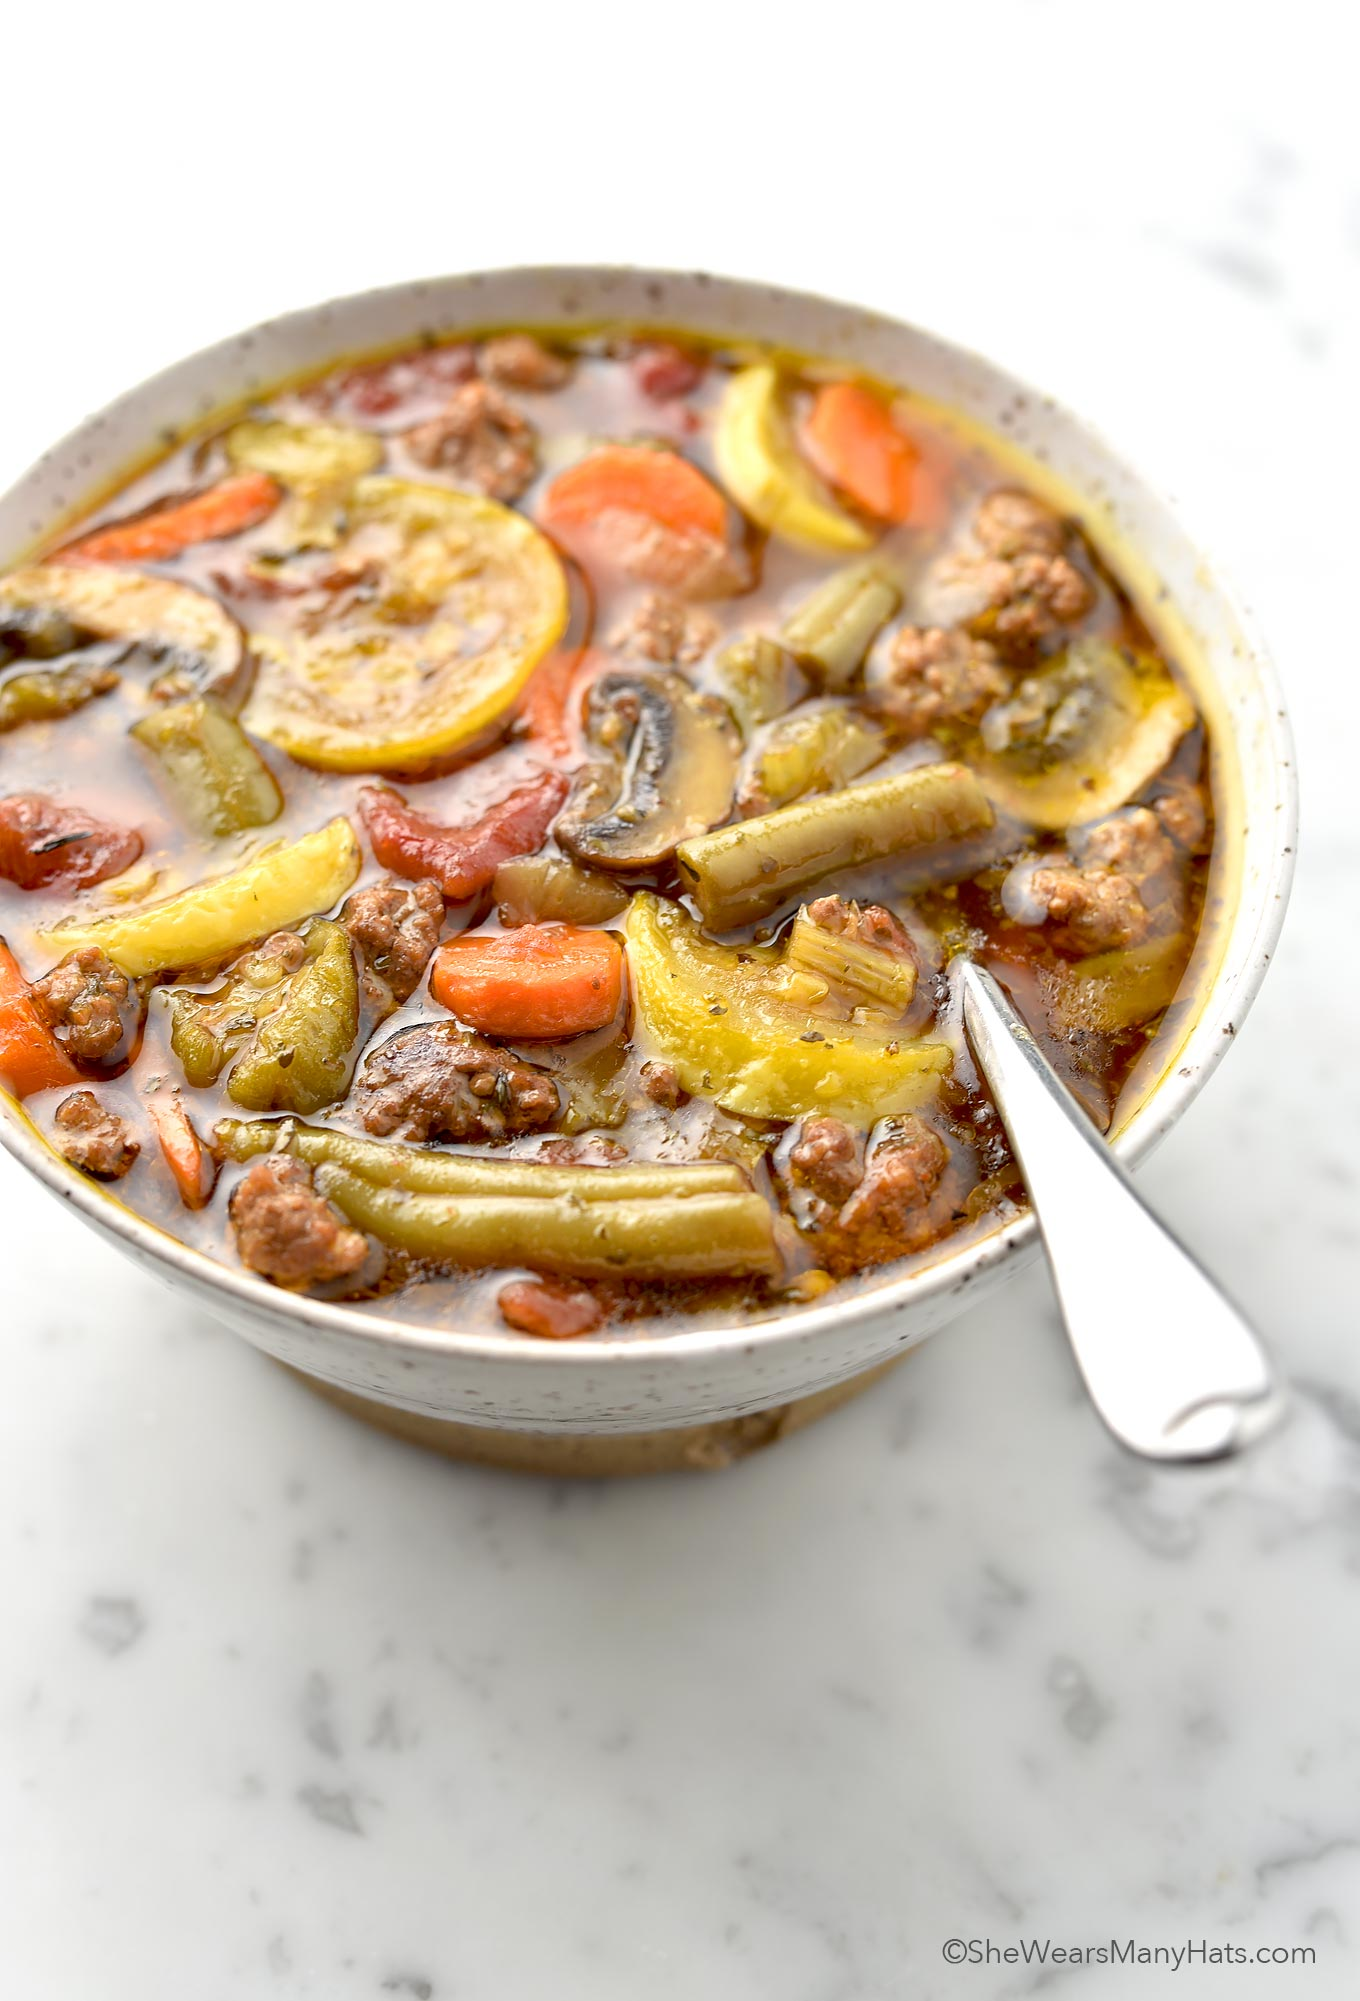 Vegetable Beef Soup Recipe   shewearsmanyhats.com